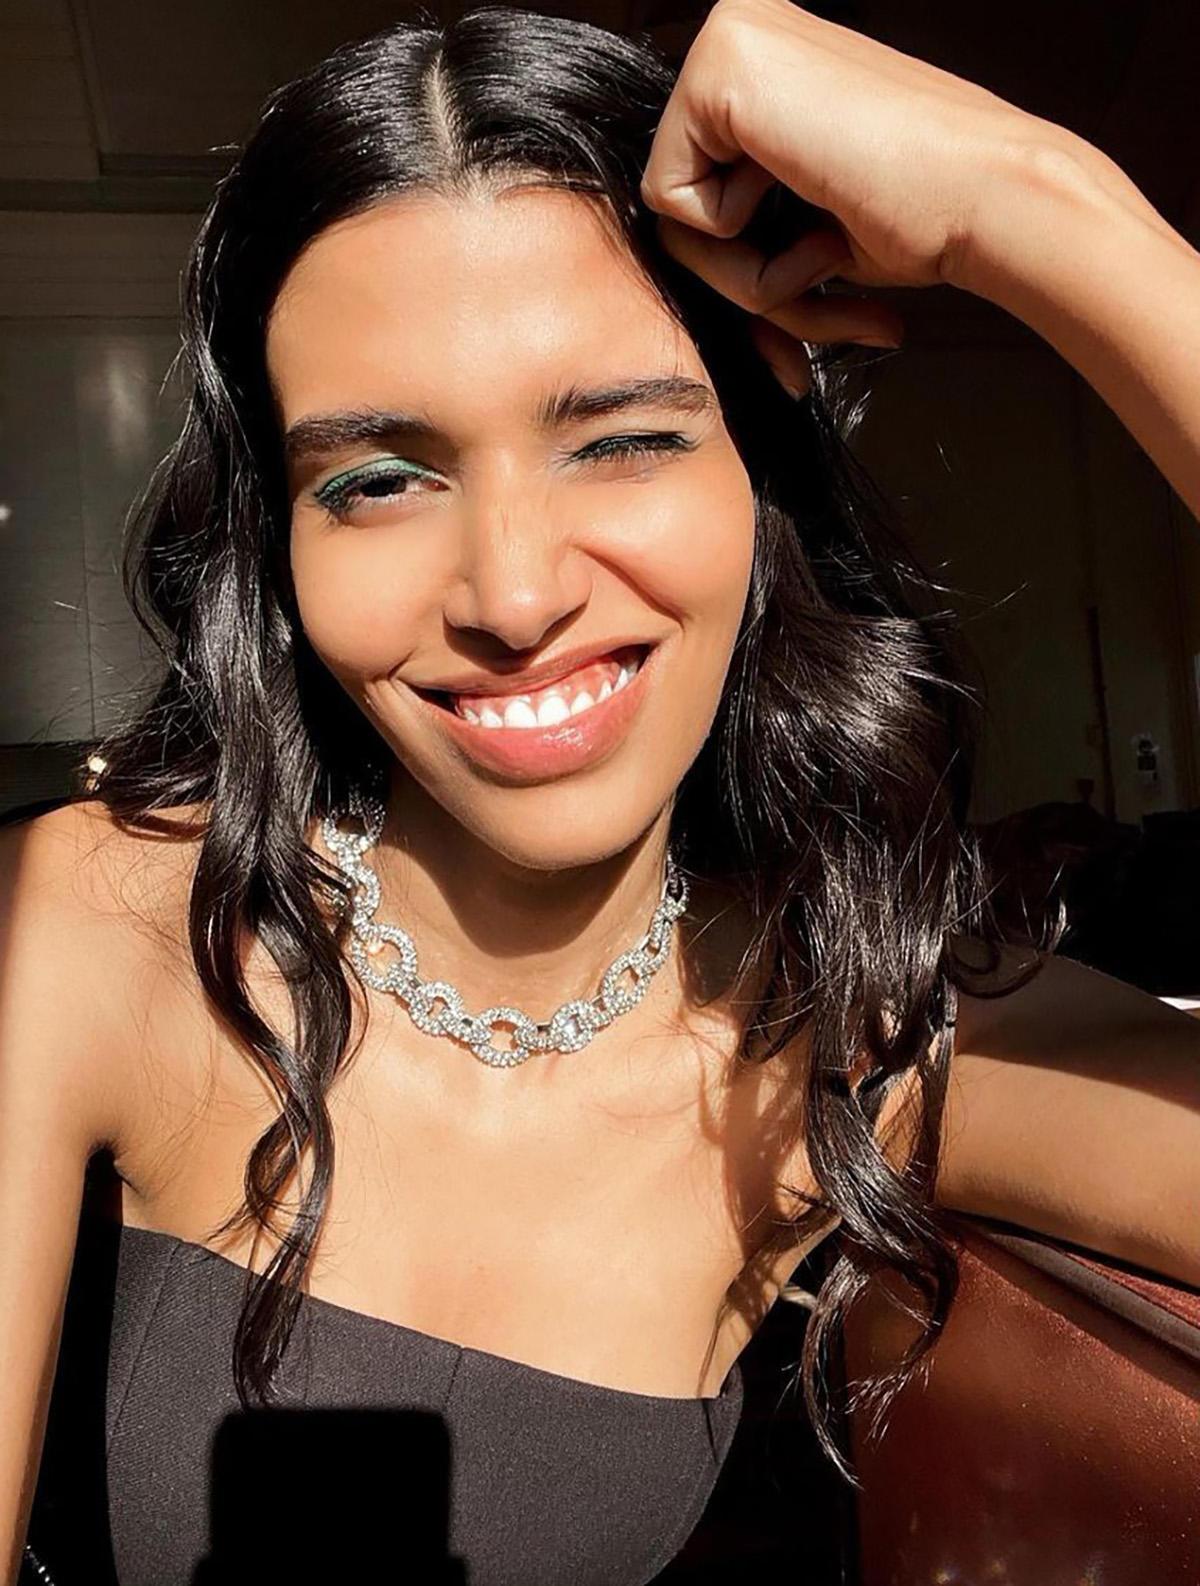 Pooja Mor' an engineer who walks for international labels